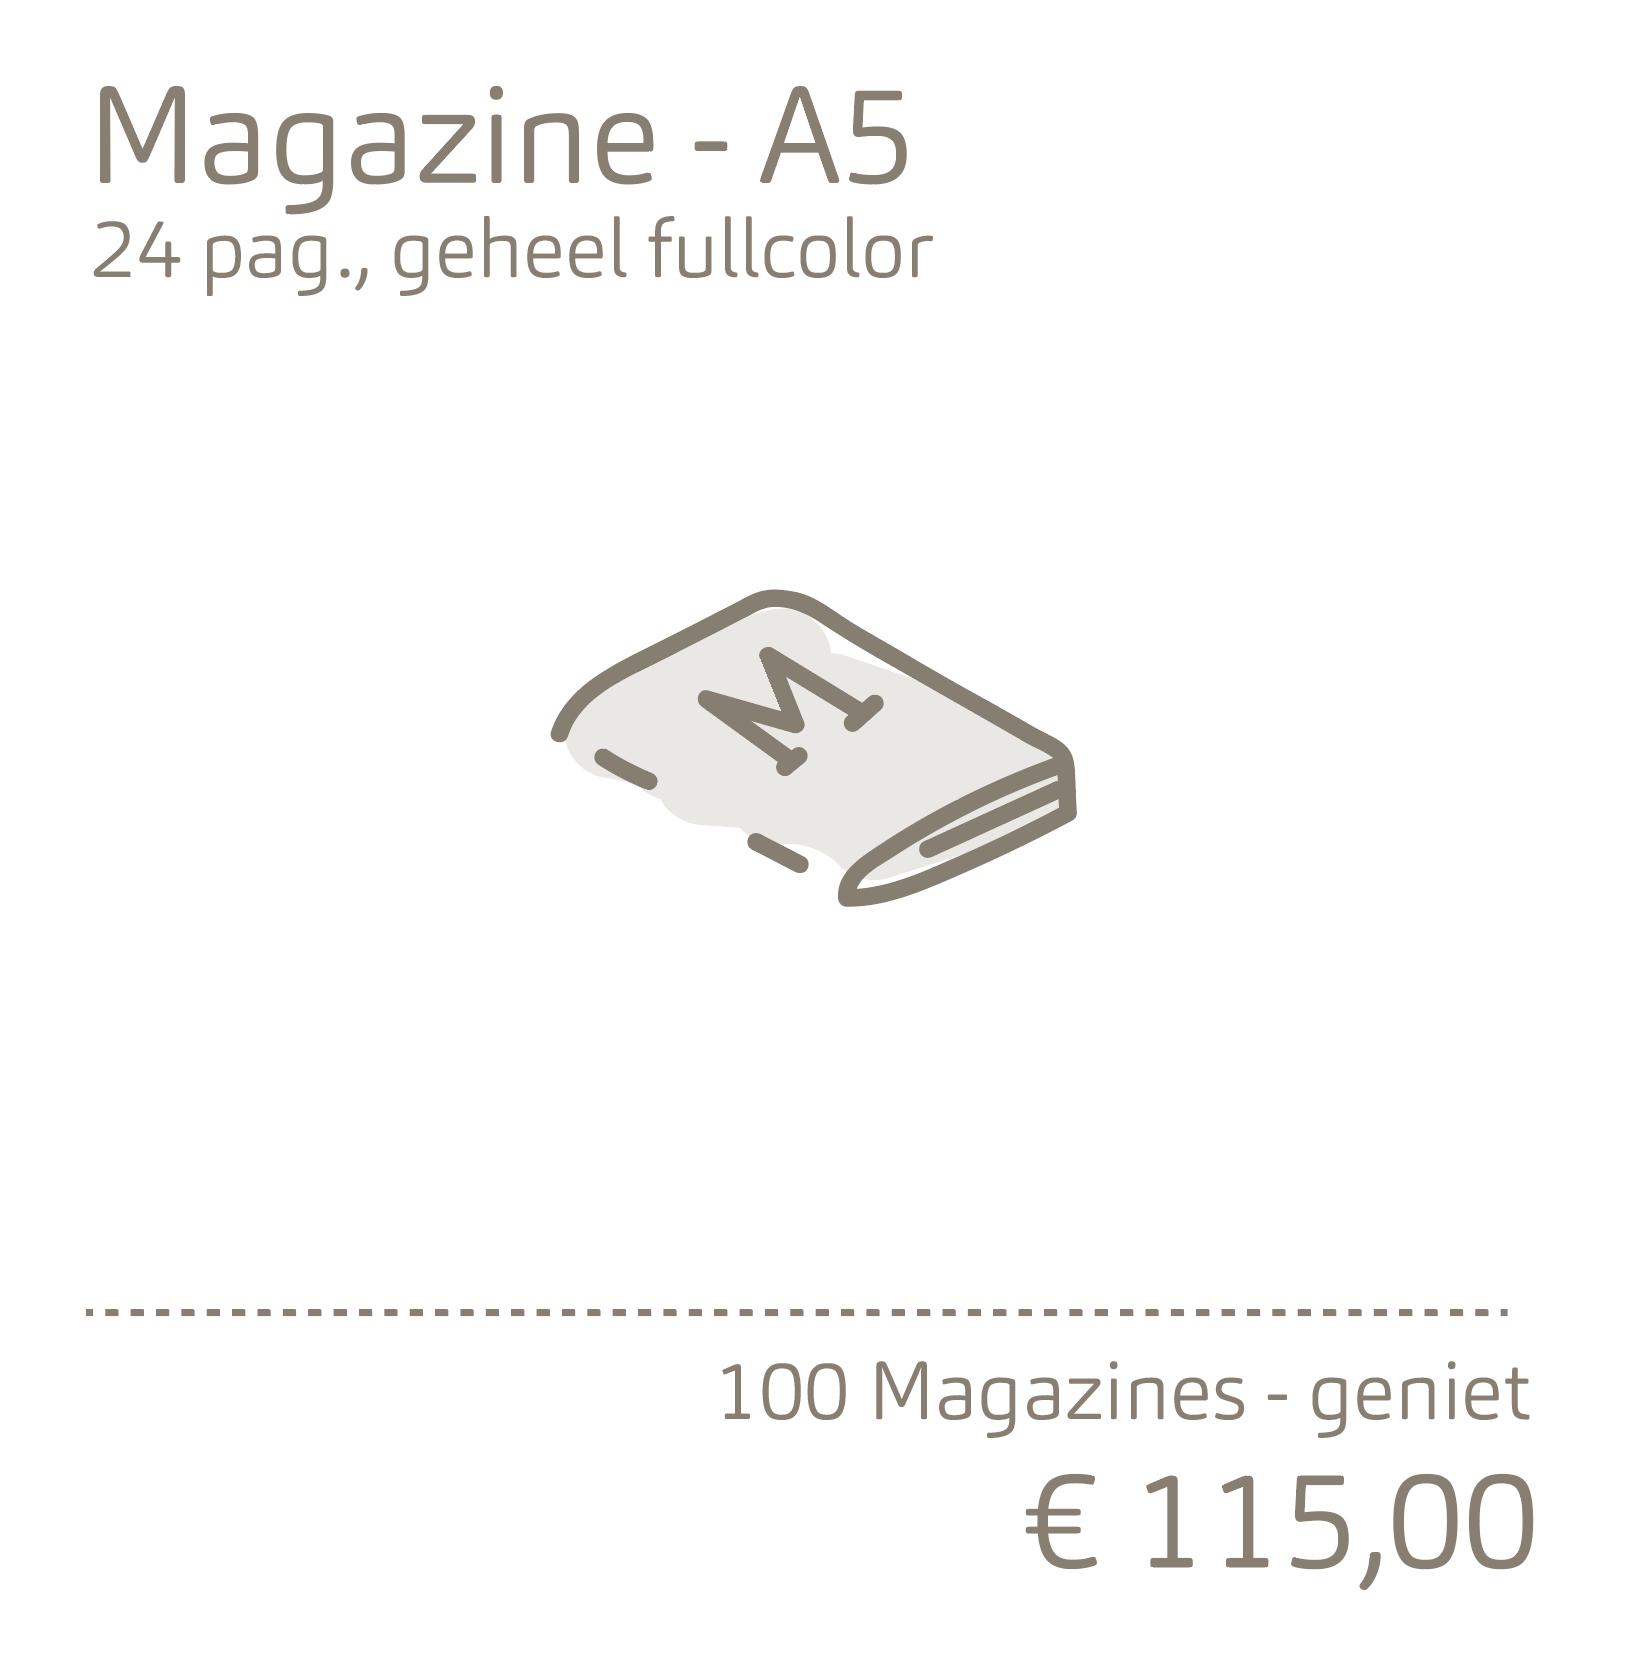 Magazines - A5